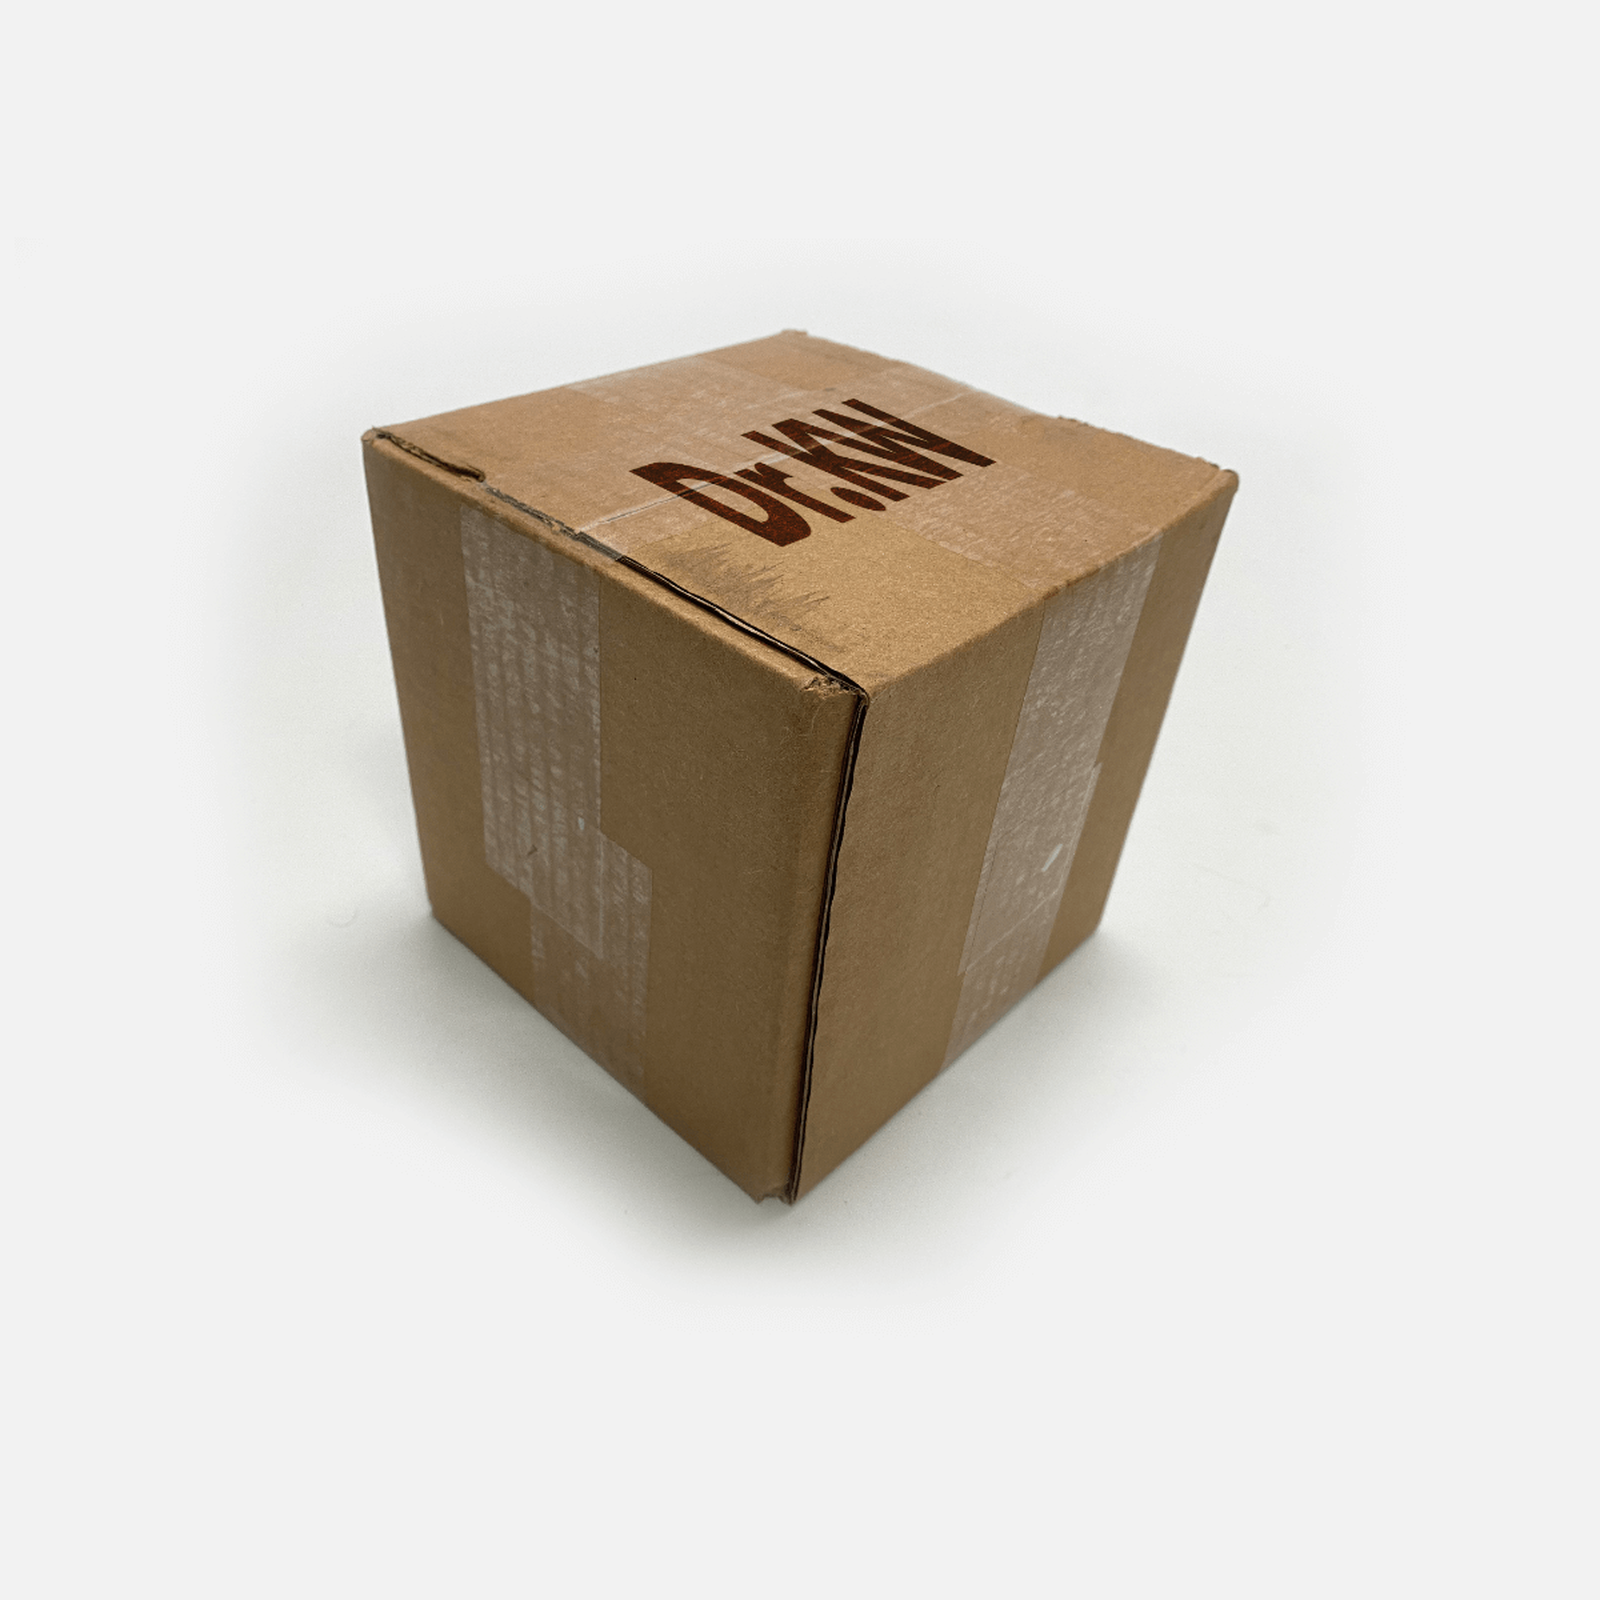 Dr. Krankenwagen's Mystery Box!